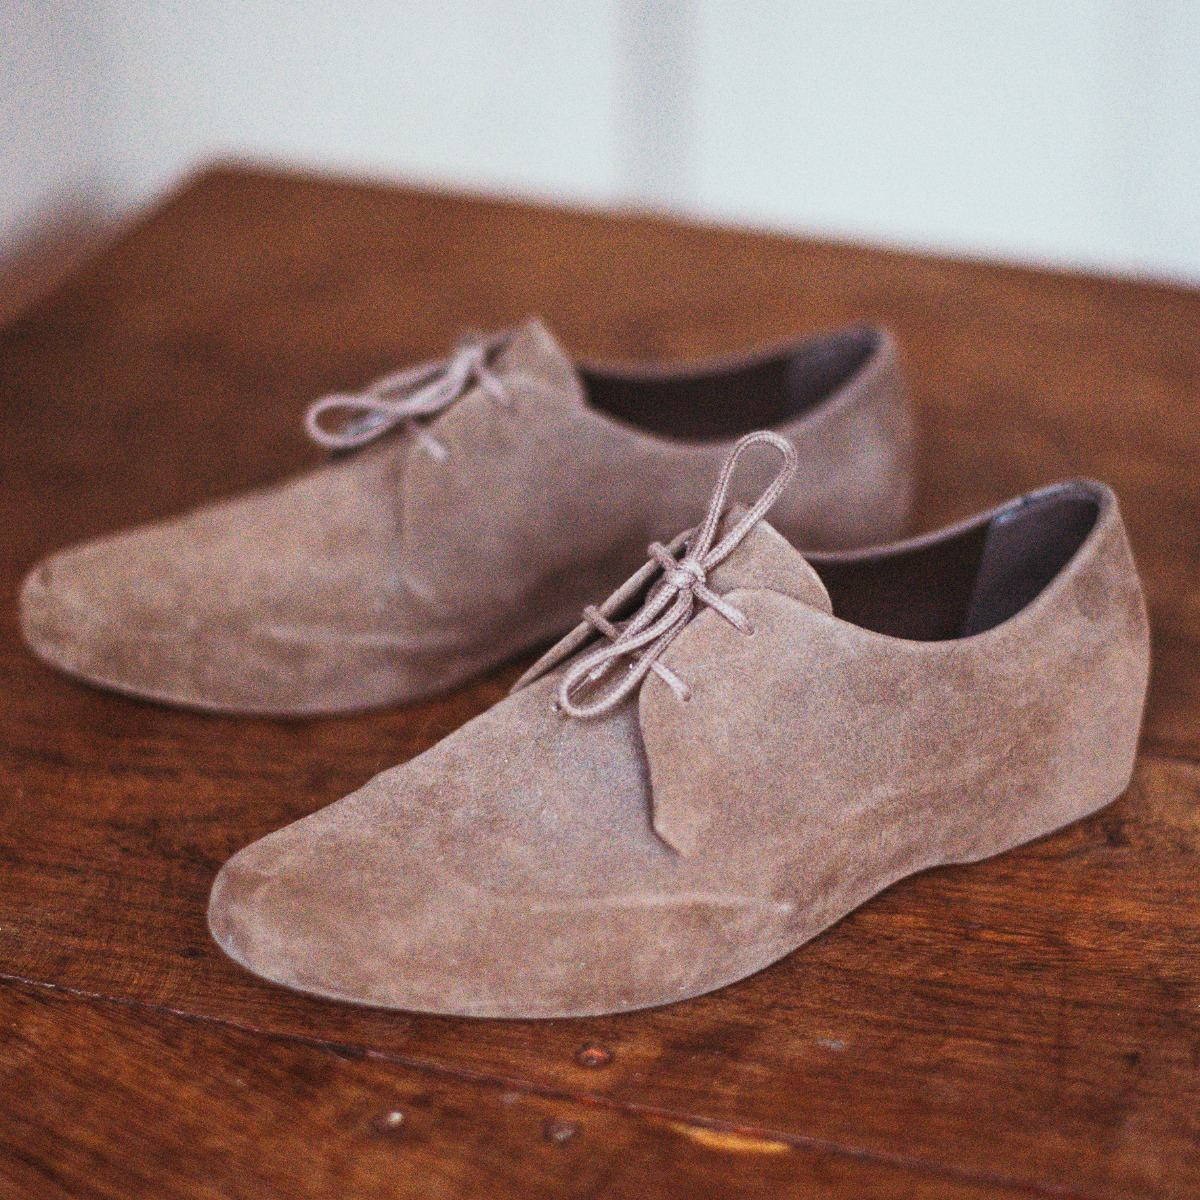 Zero Zapatos Melissa Talle Hombre 00 M 500 Gamuza 411 qUzMGSVp